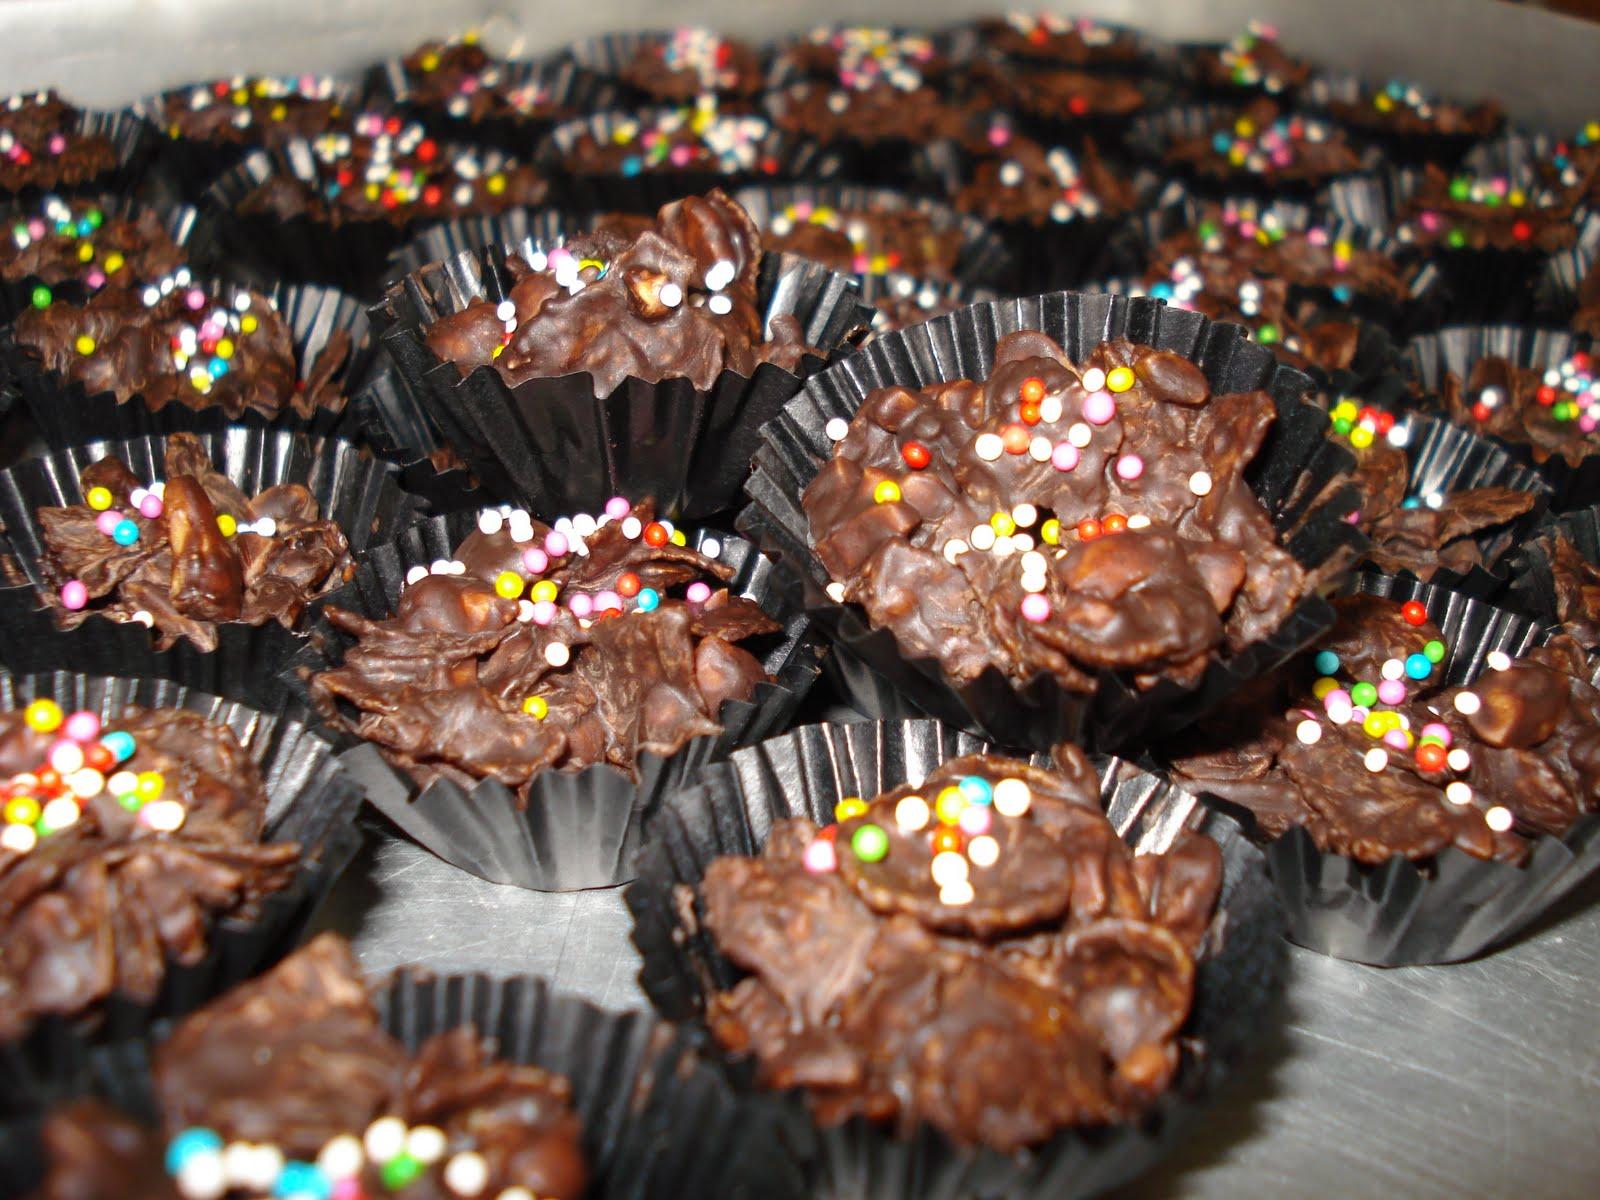 kue kering yang satu ini menjadi kue yang laris manis sewaktu lebaran ...